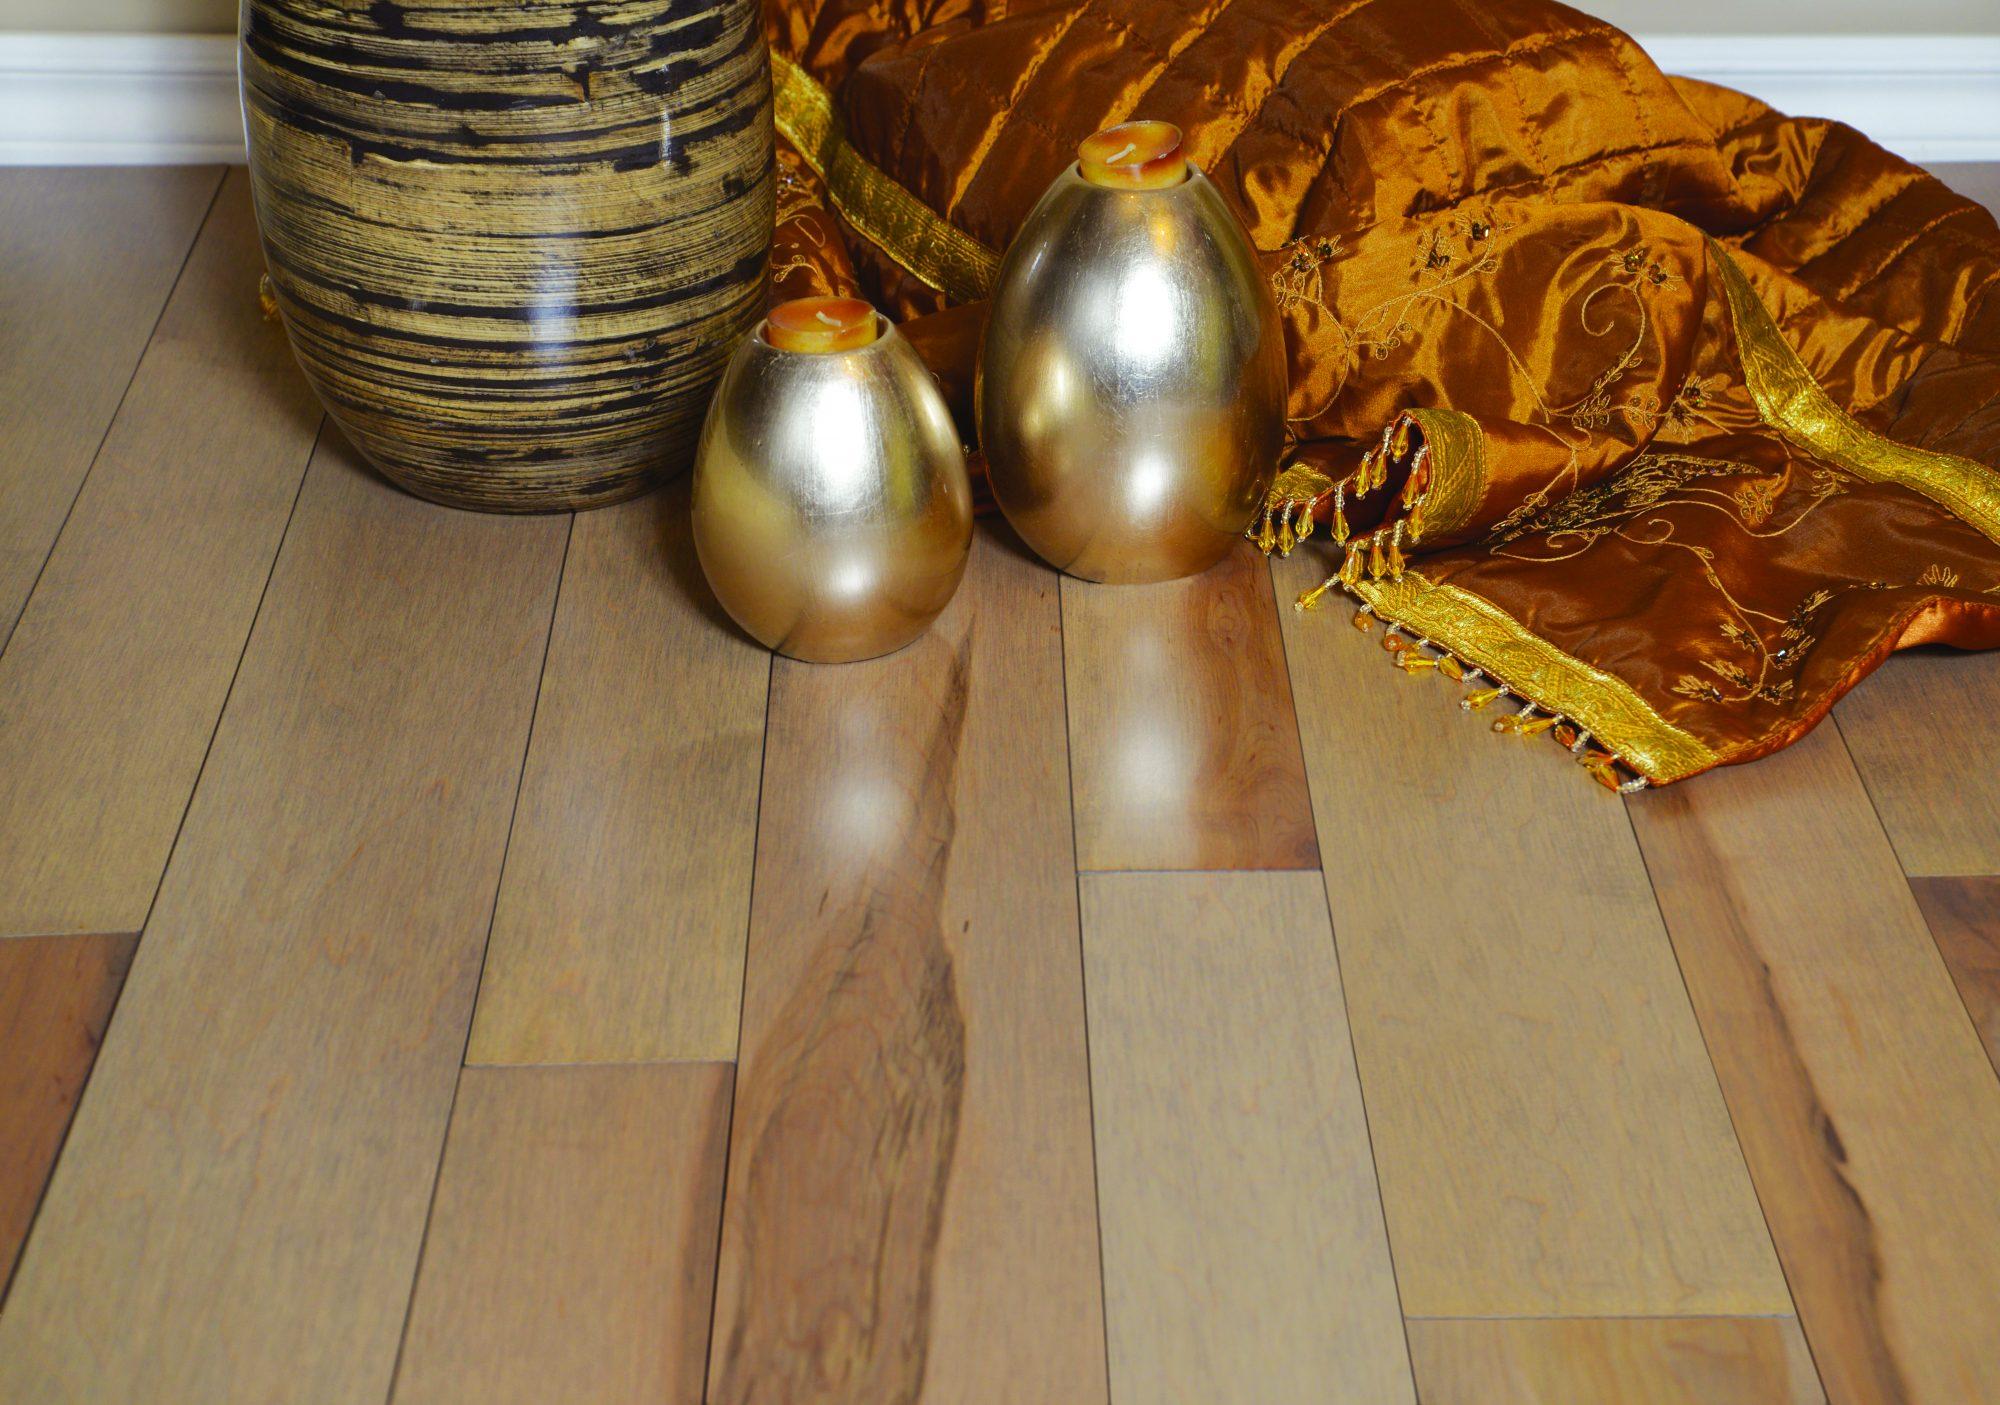 Wooden Floor Made of Maple